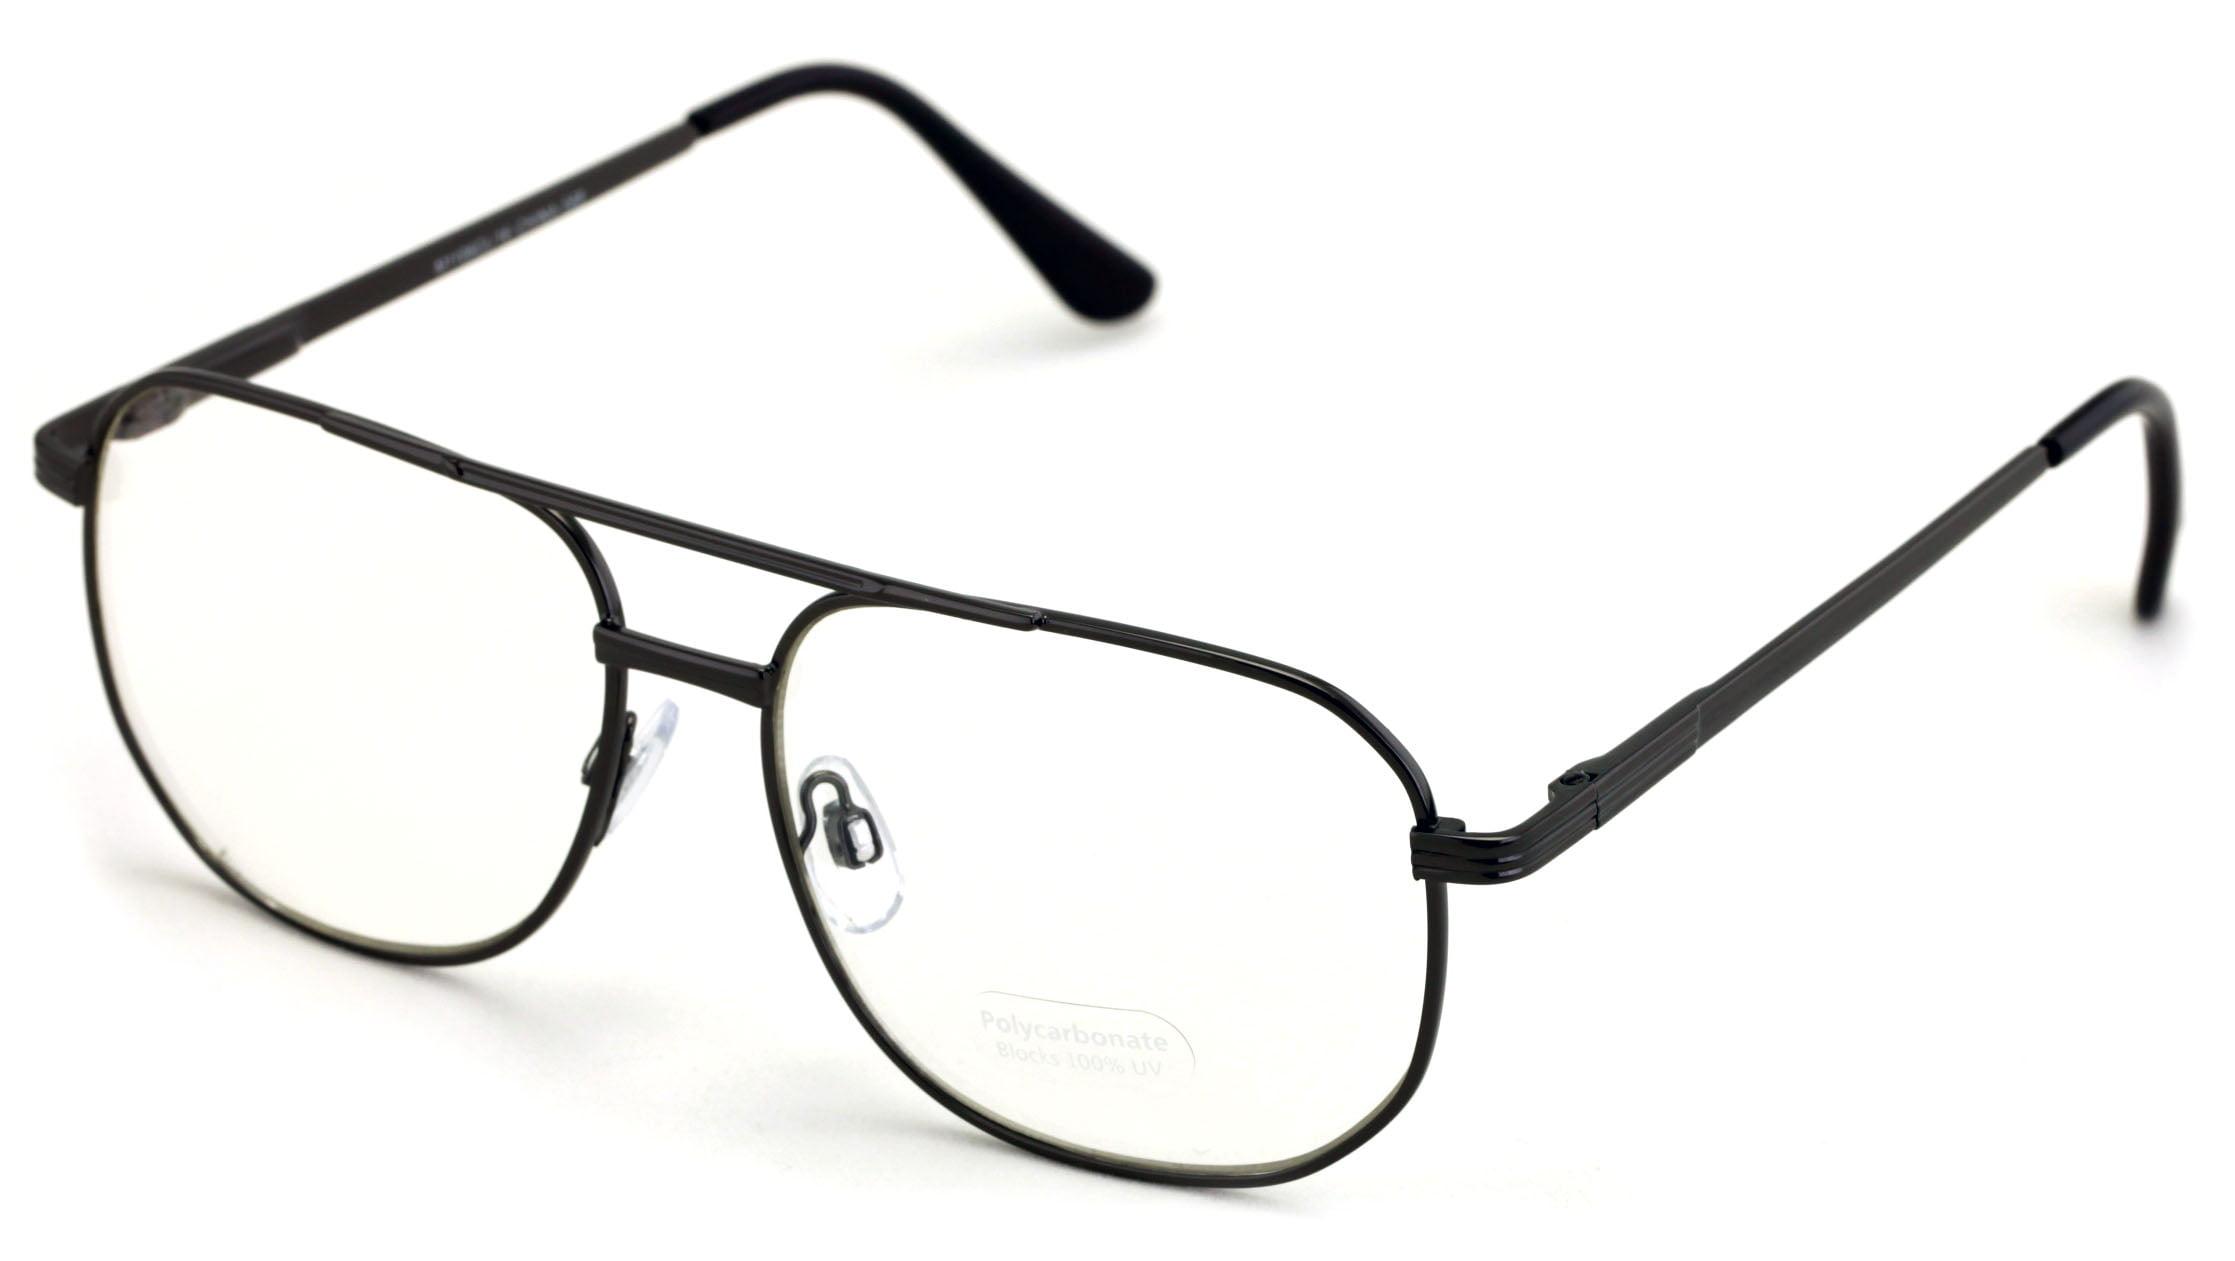 V.W.E. - Metal Aviator Glasses - Big Lens Spring Hinge Square - Gold  Gunmetal Old Men Grandpa Nerd Clear Lens - Walmart.com - Walmart.com